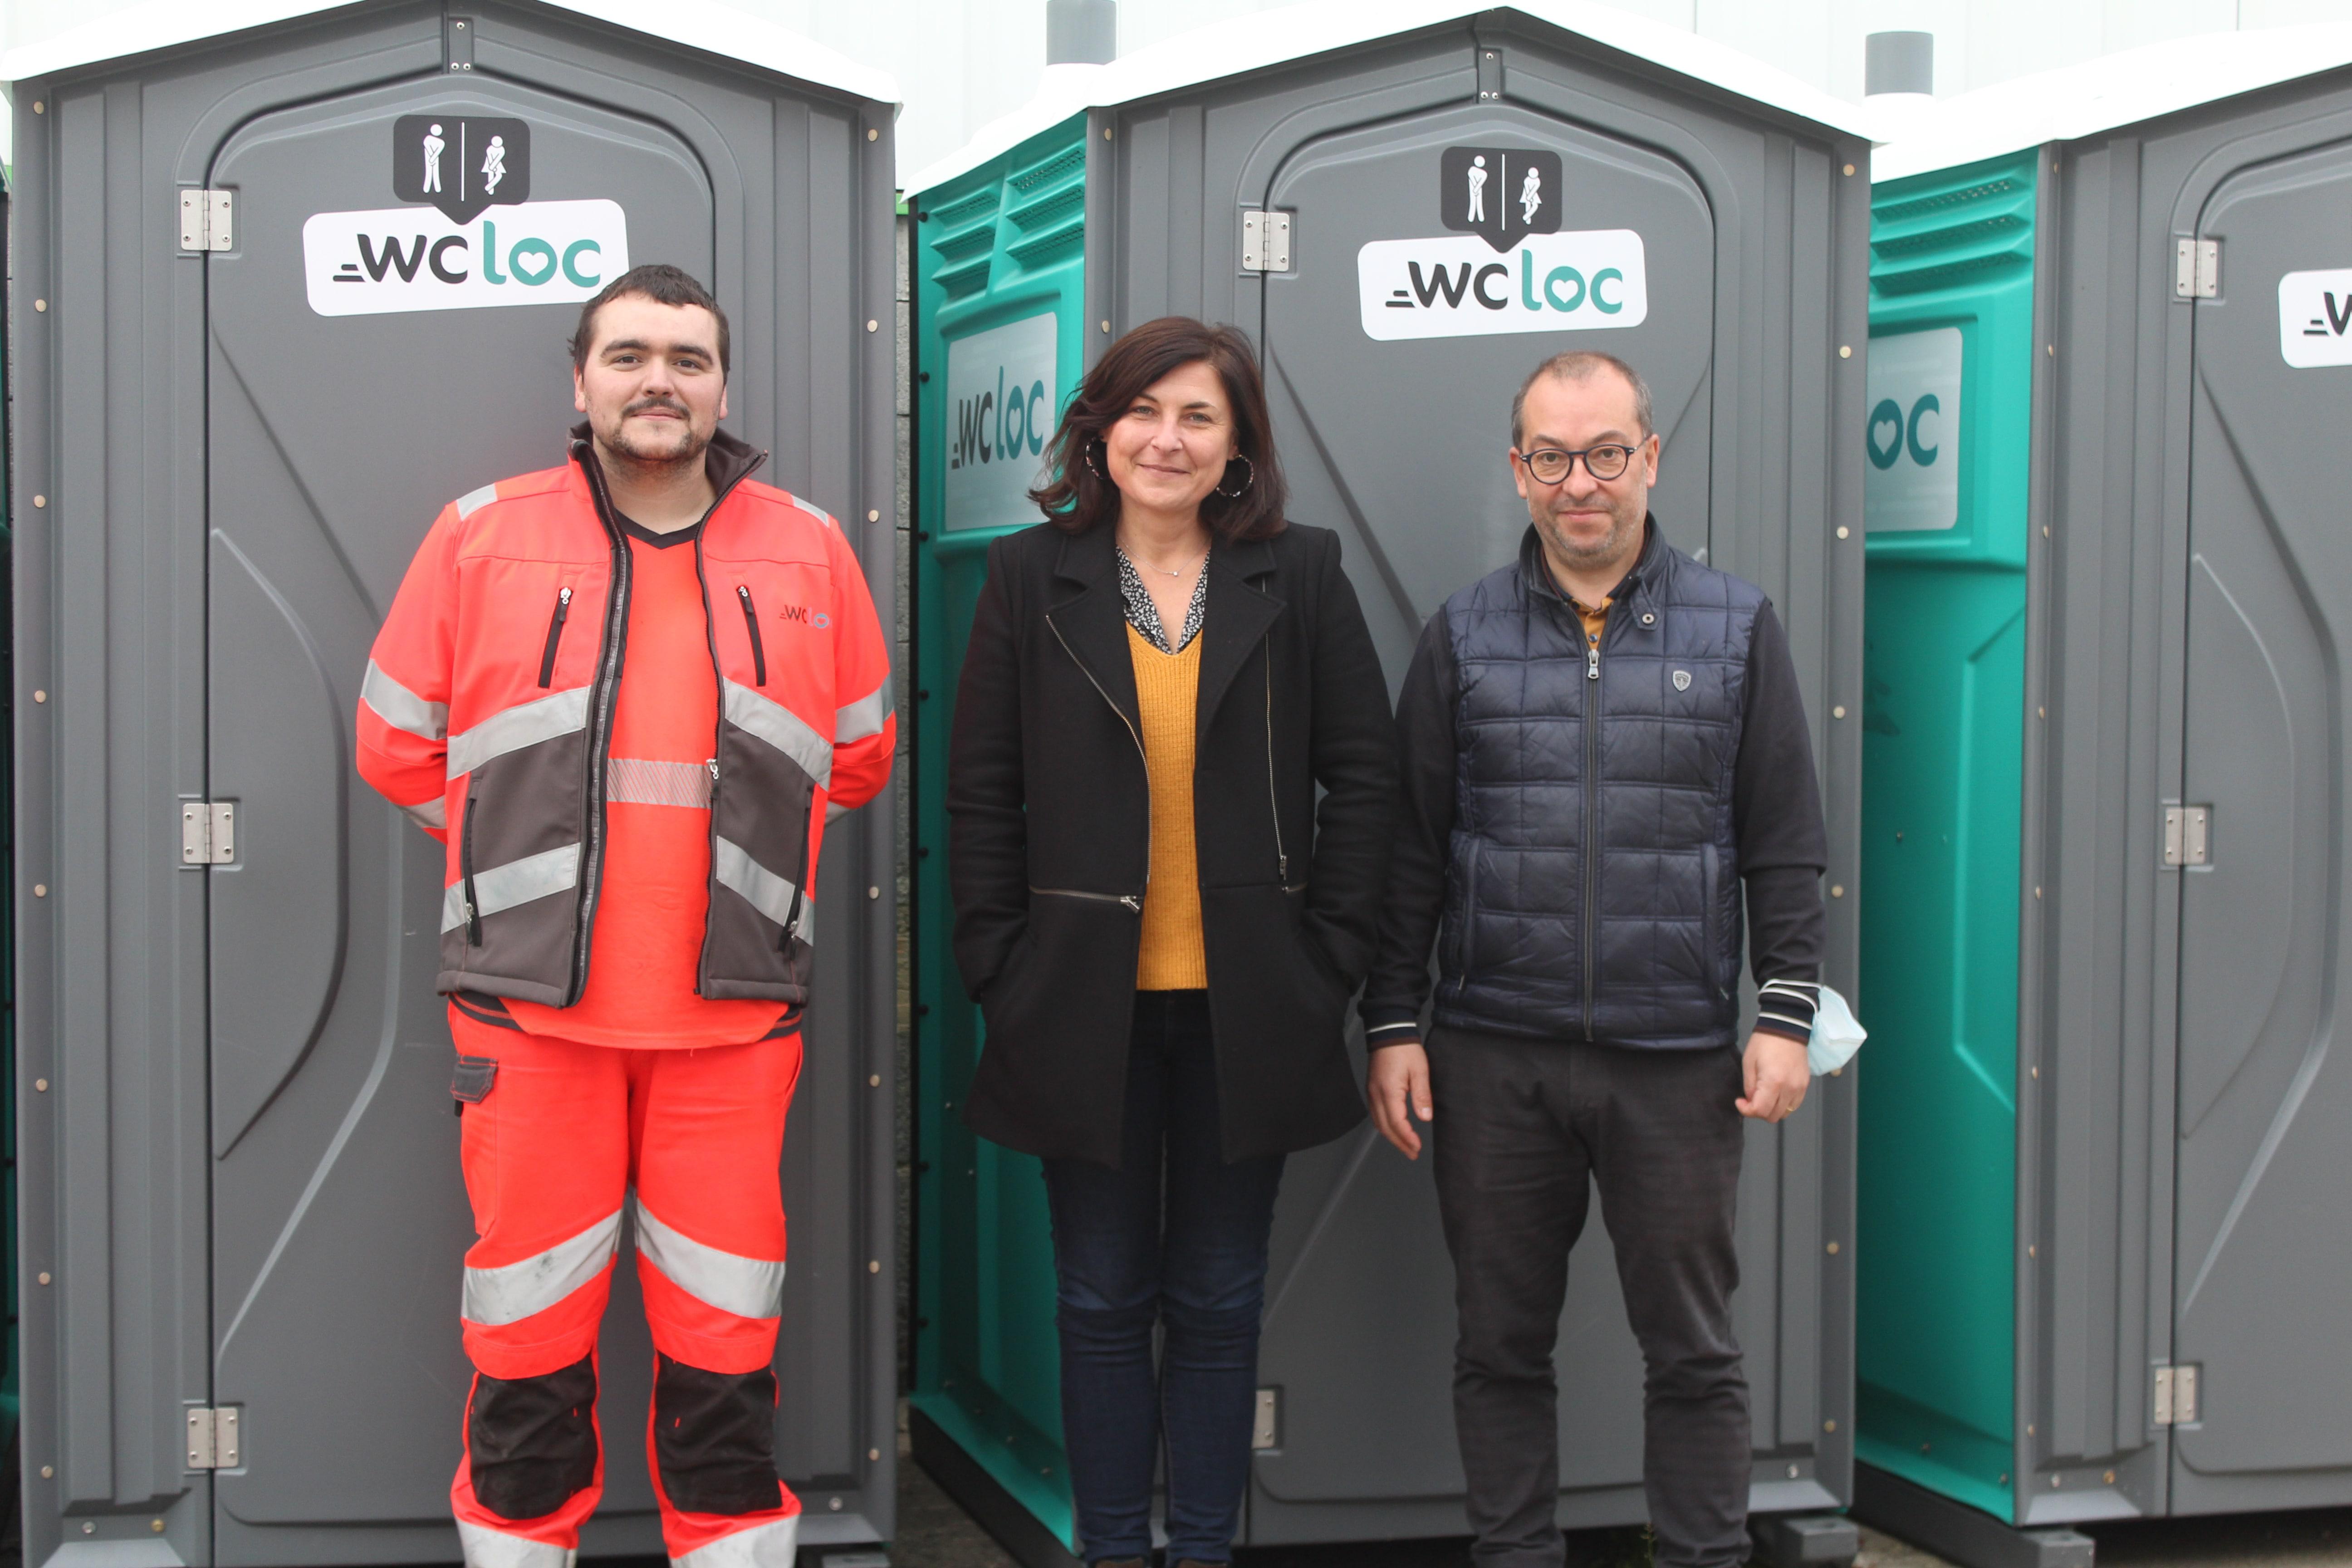 WC Loc Rennes